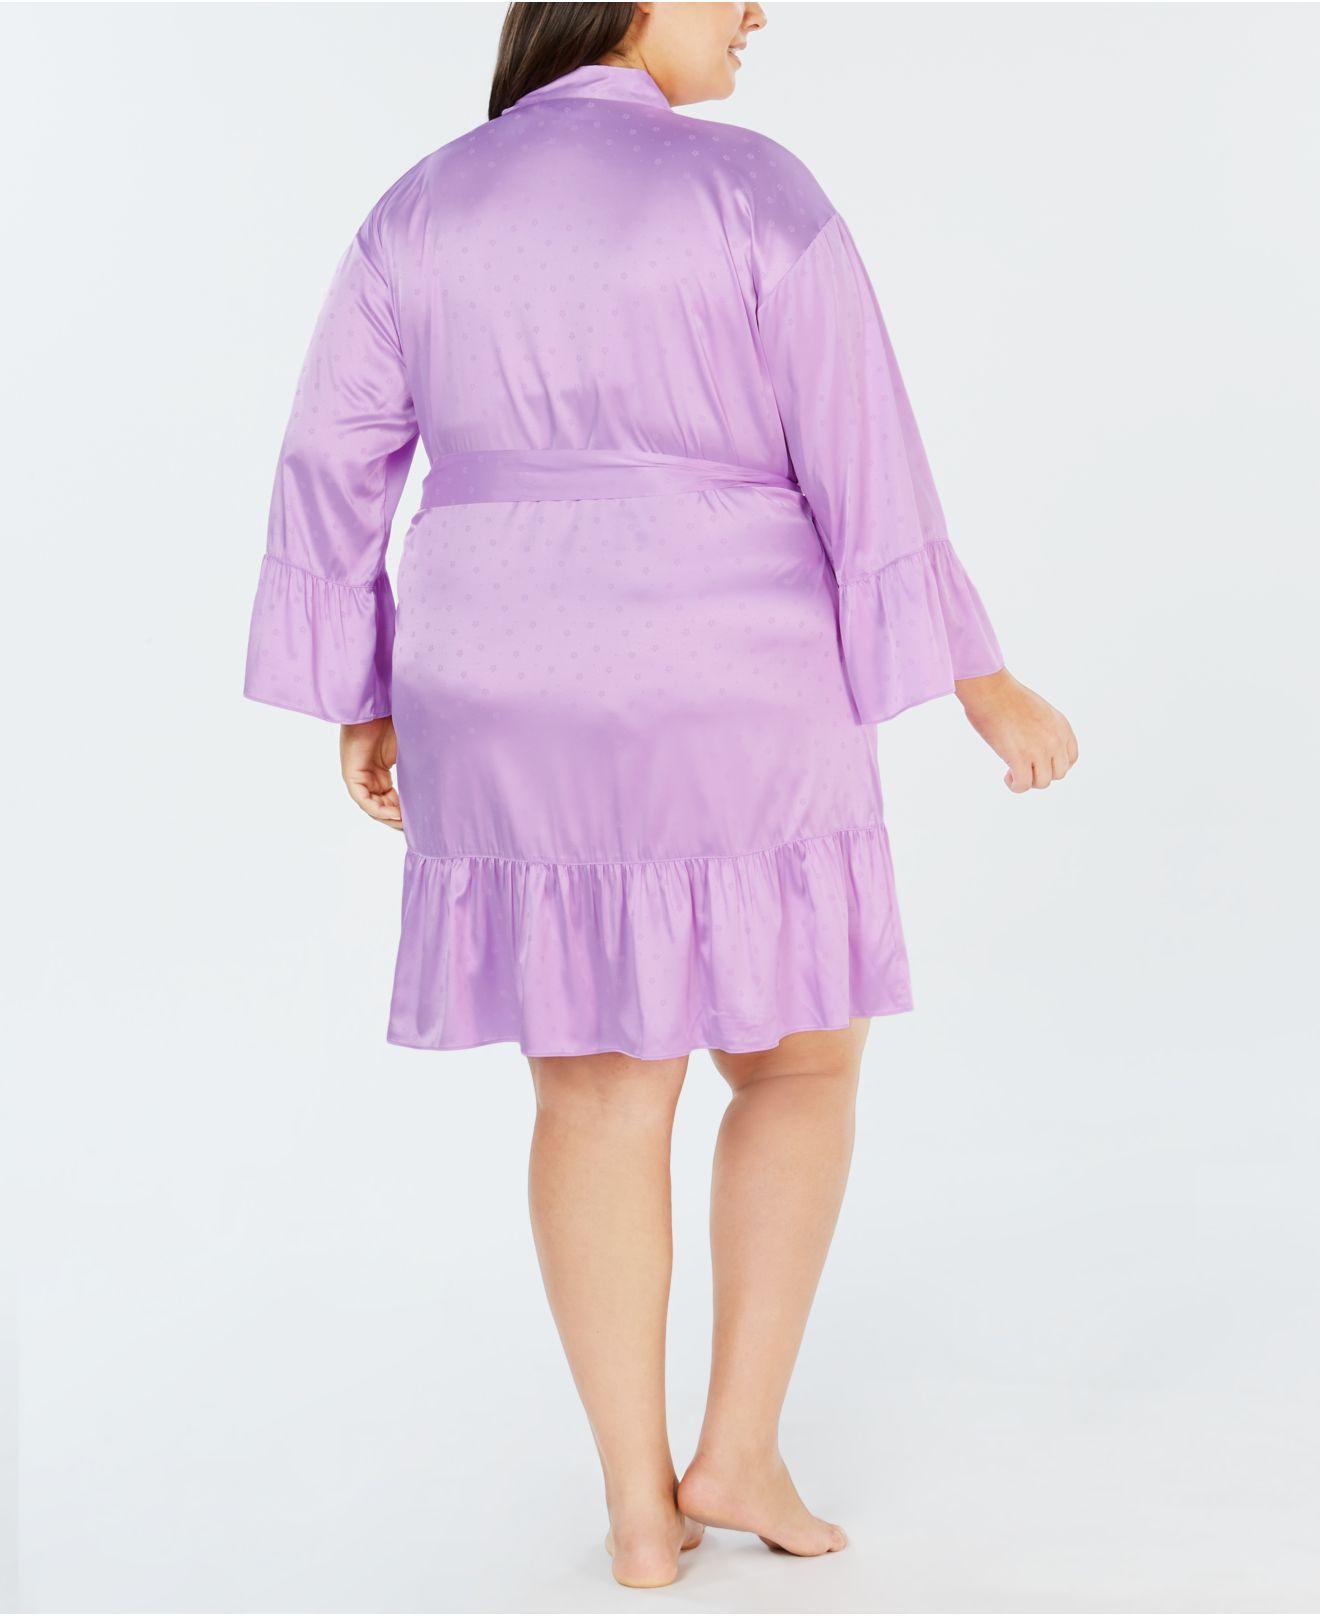 53ab438751566 Lyst - INC International Concepts I.n.c. Plus Size Satin Jacquard Flounce  Wrap Robe